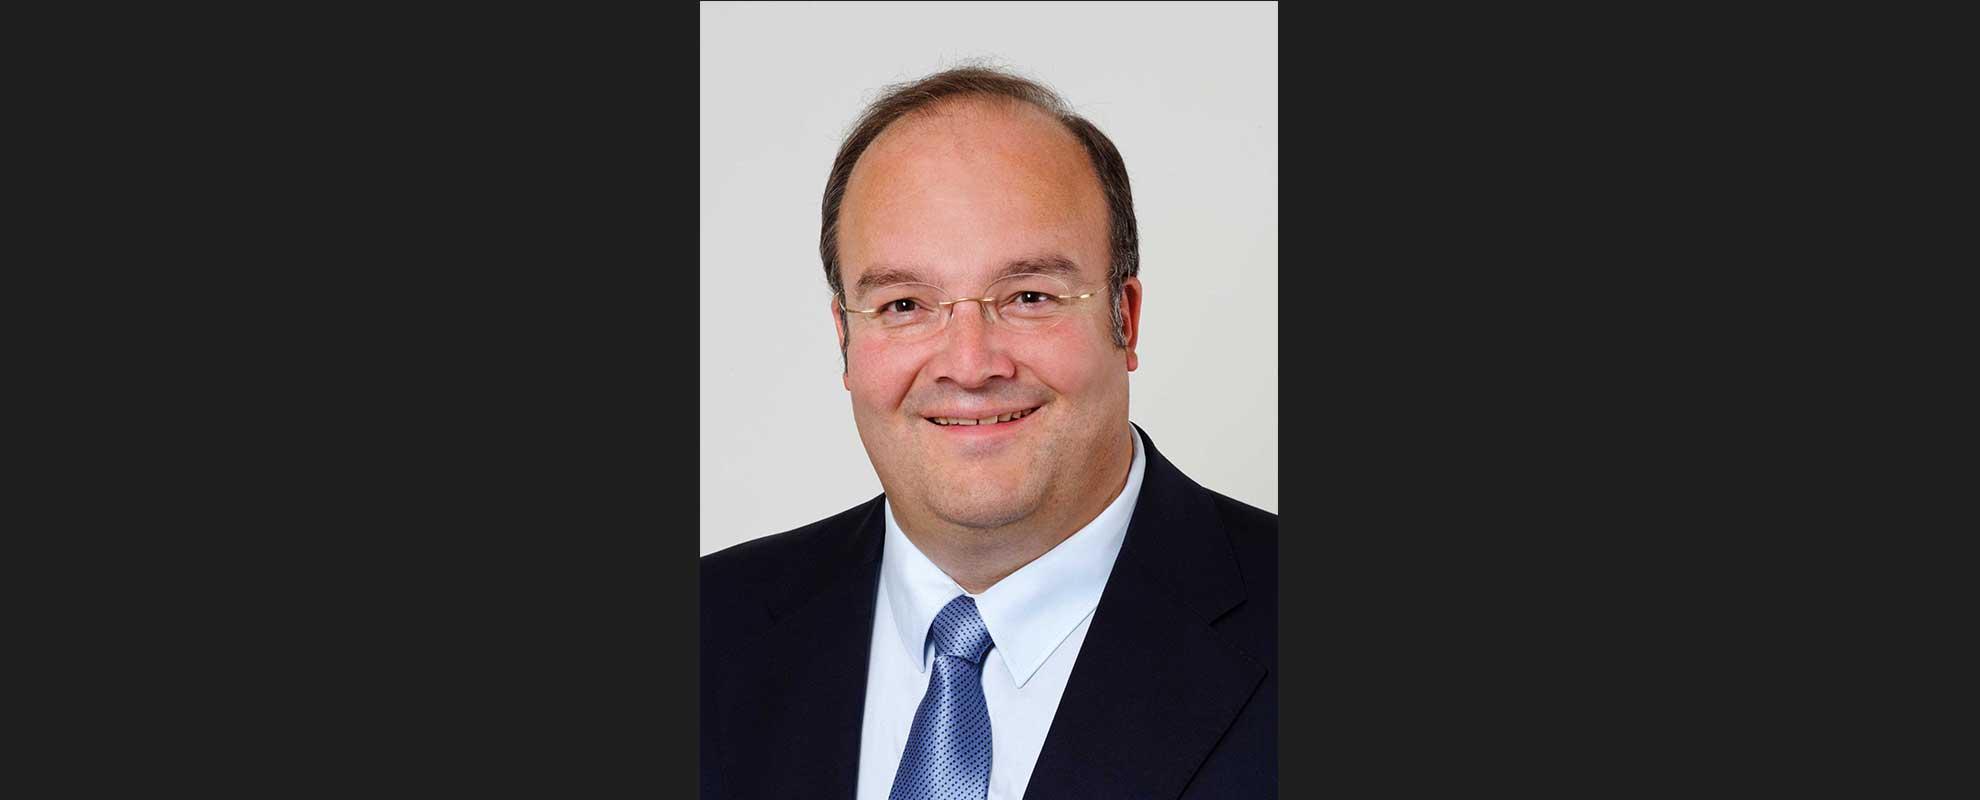 Paul-Metz-Buergermeister